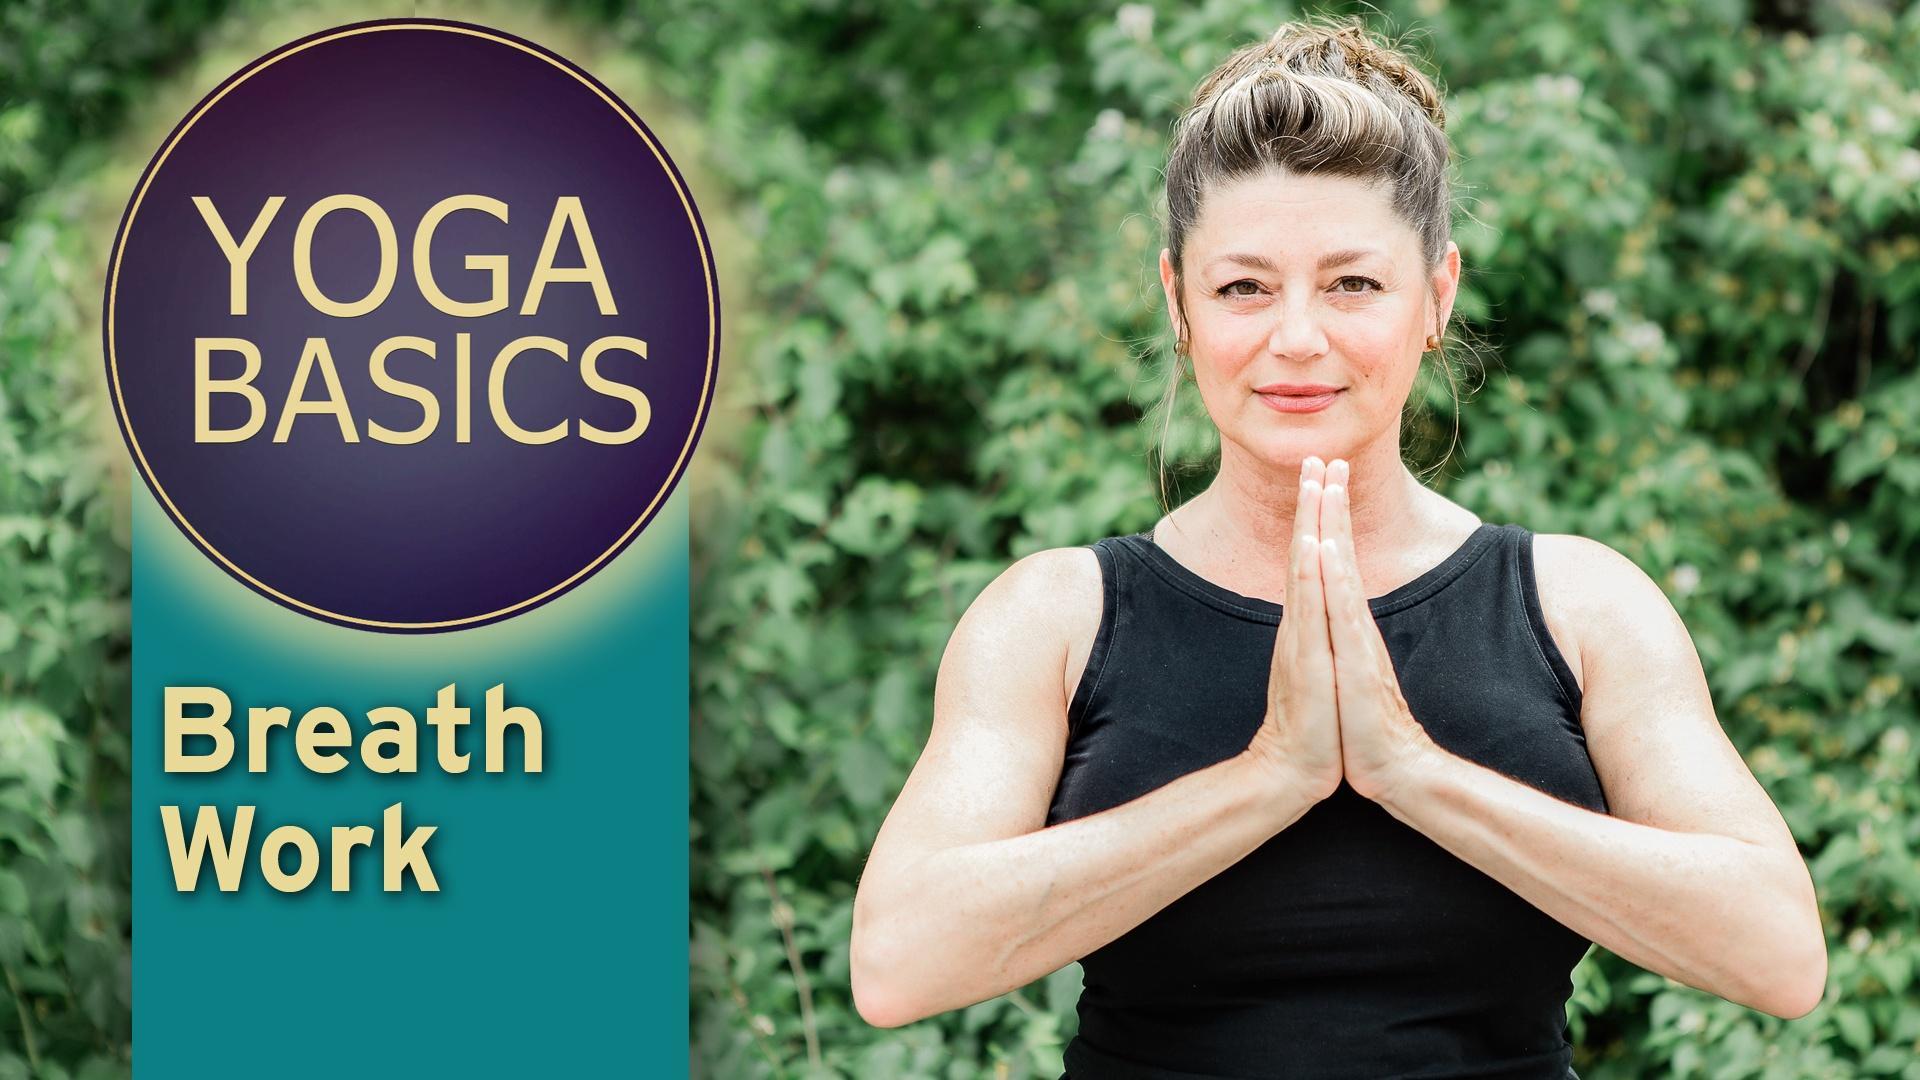 Yoga Basics with patty: Breath Work | Season 1 Episode 05/18